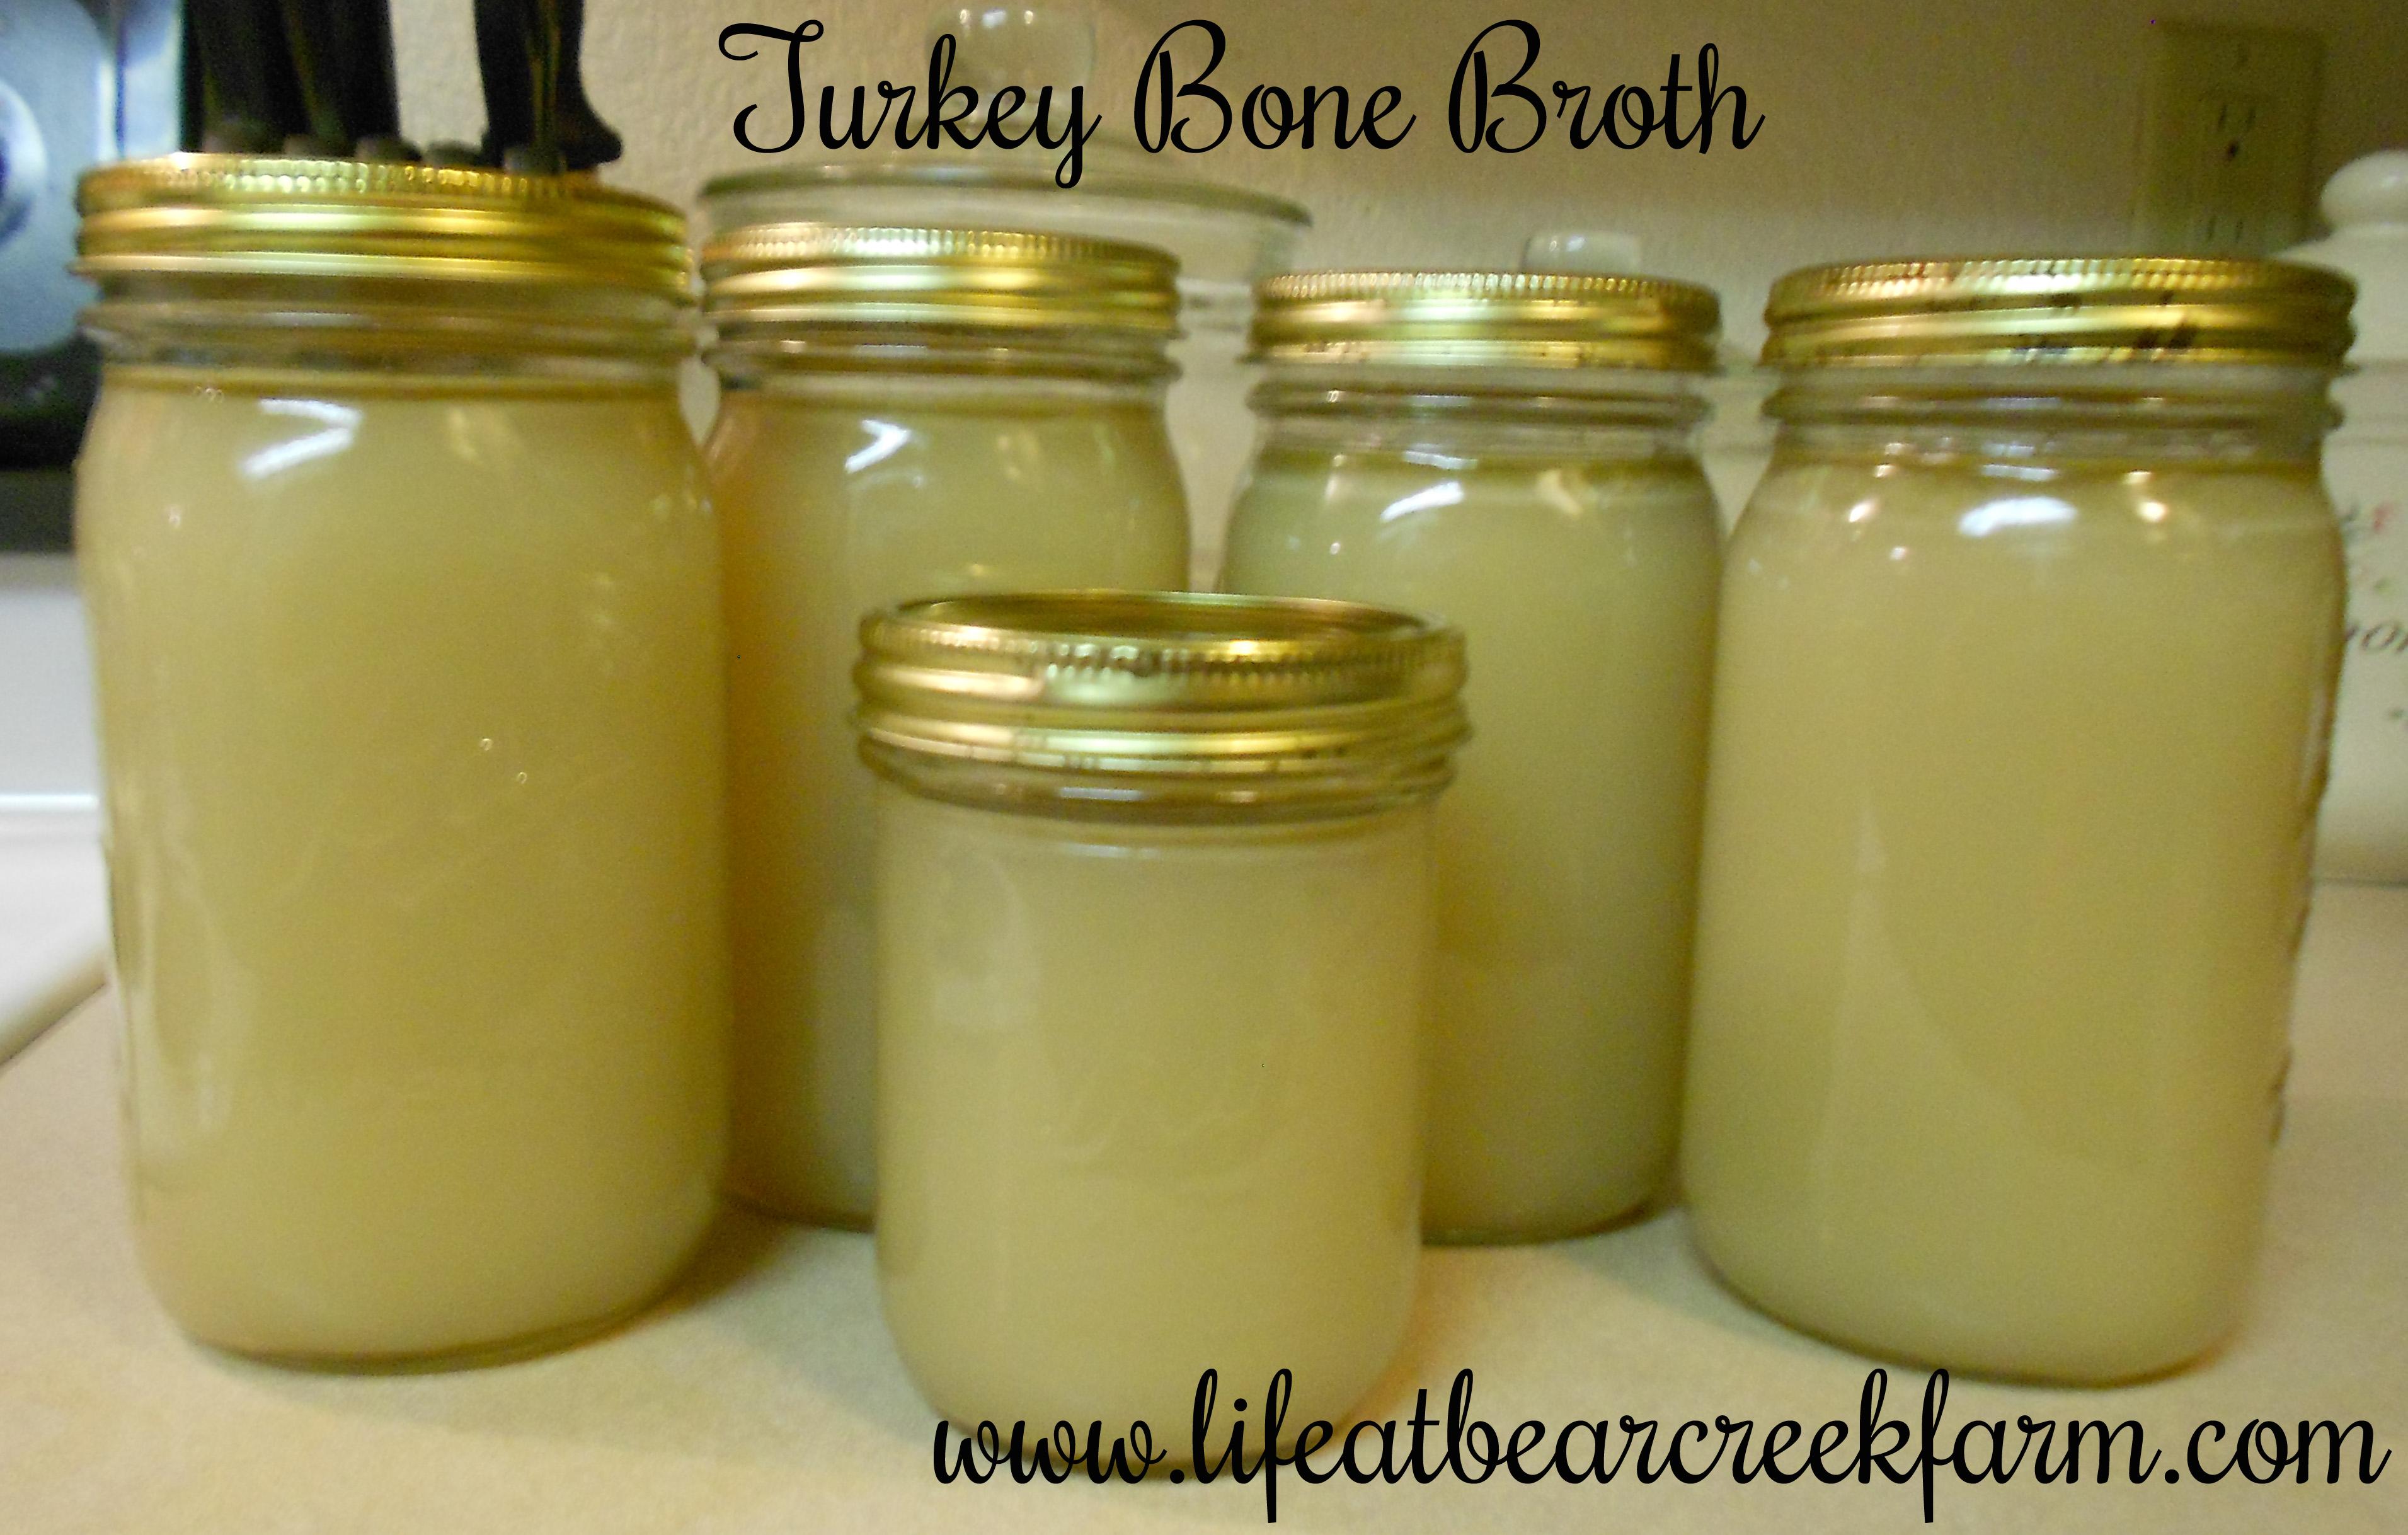 Bone broth ready for freezer